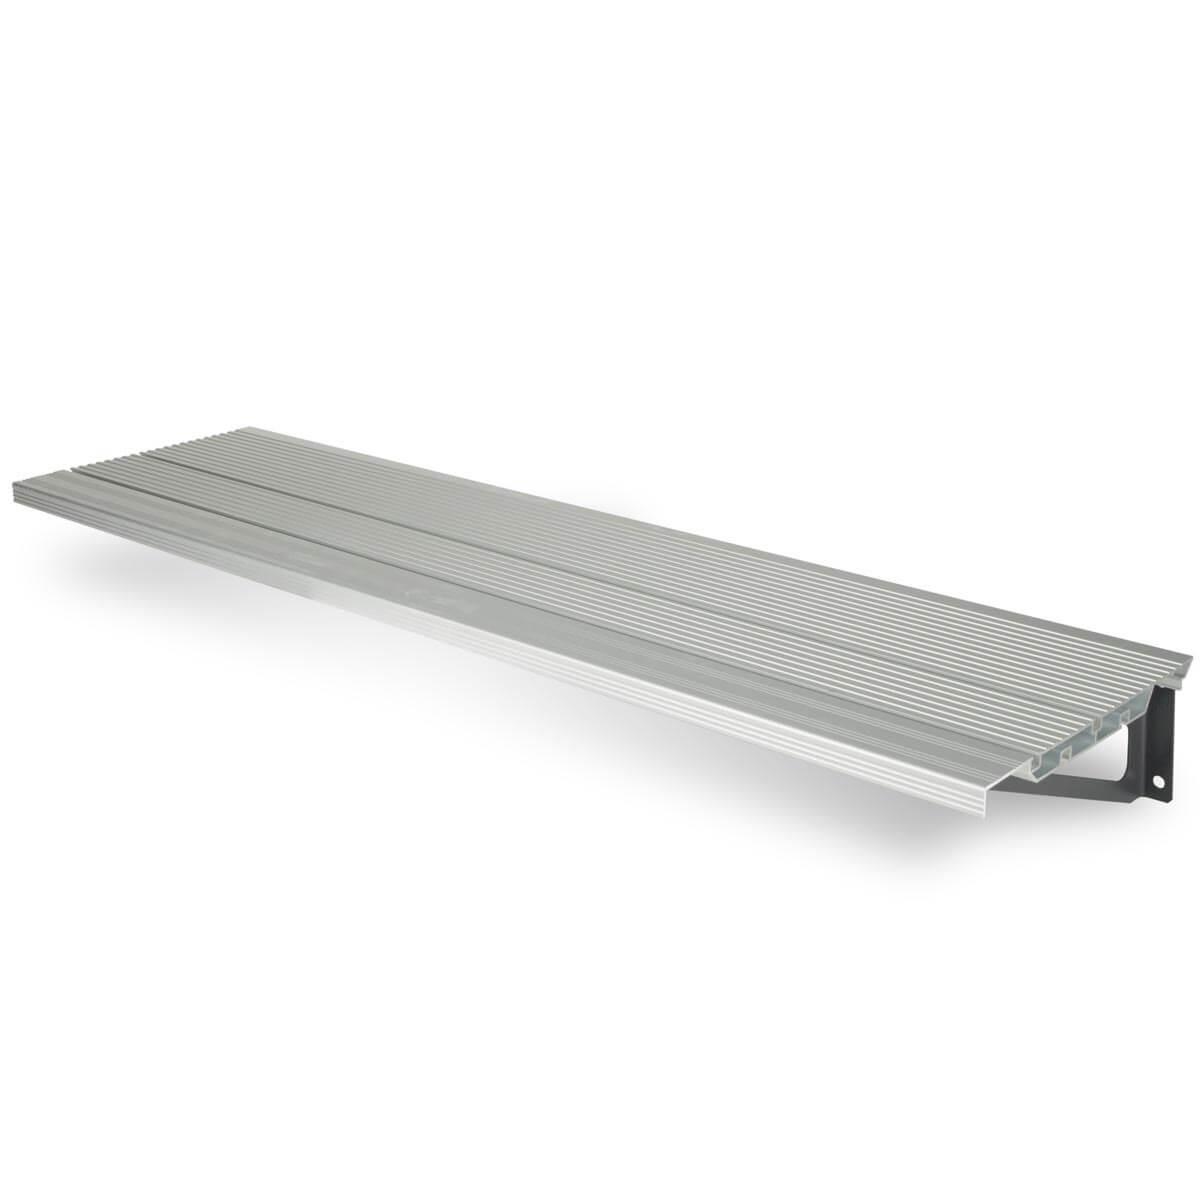 54991 Rubi Table Extension rail saw